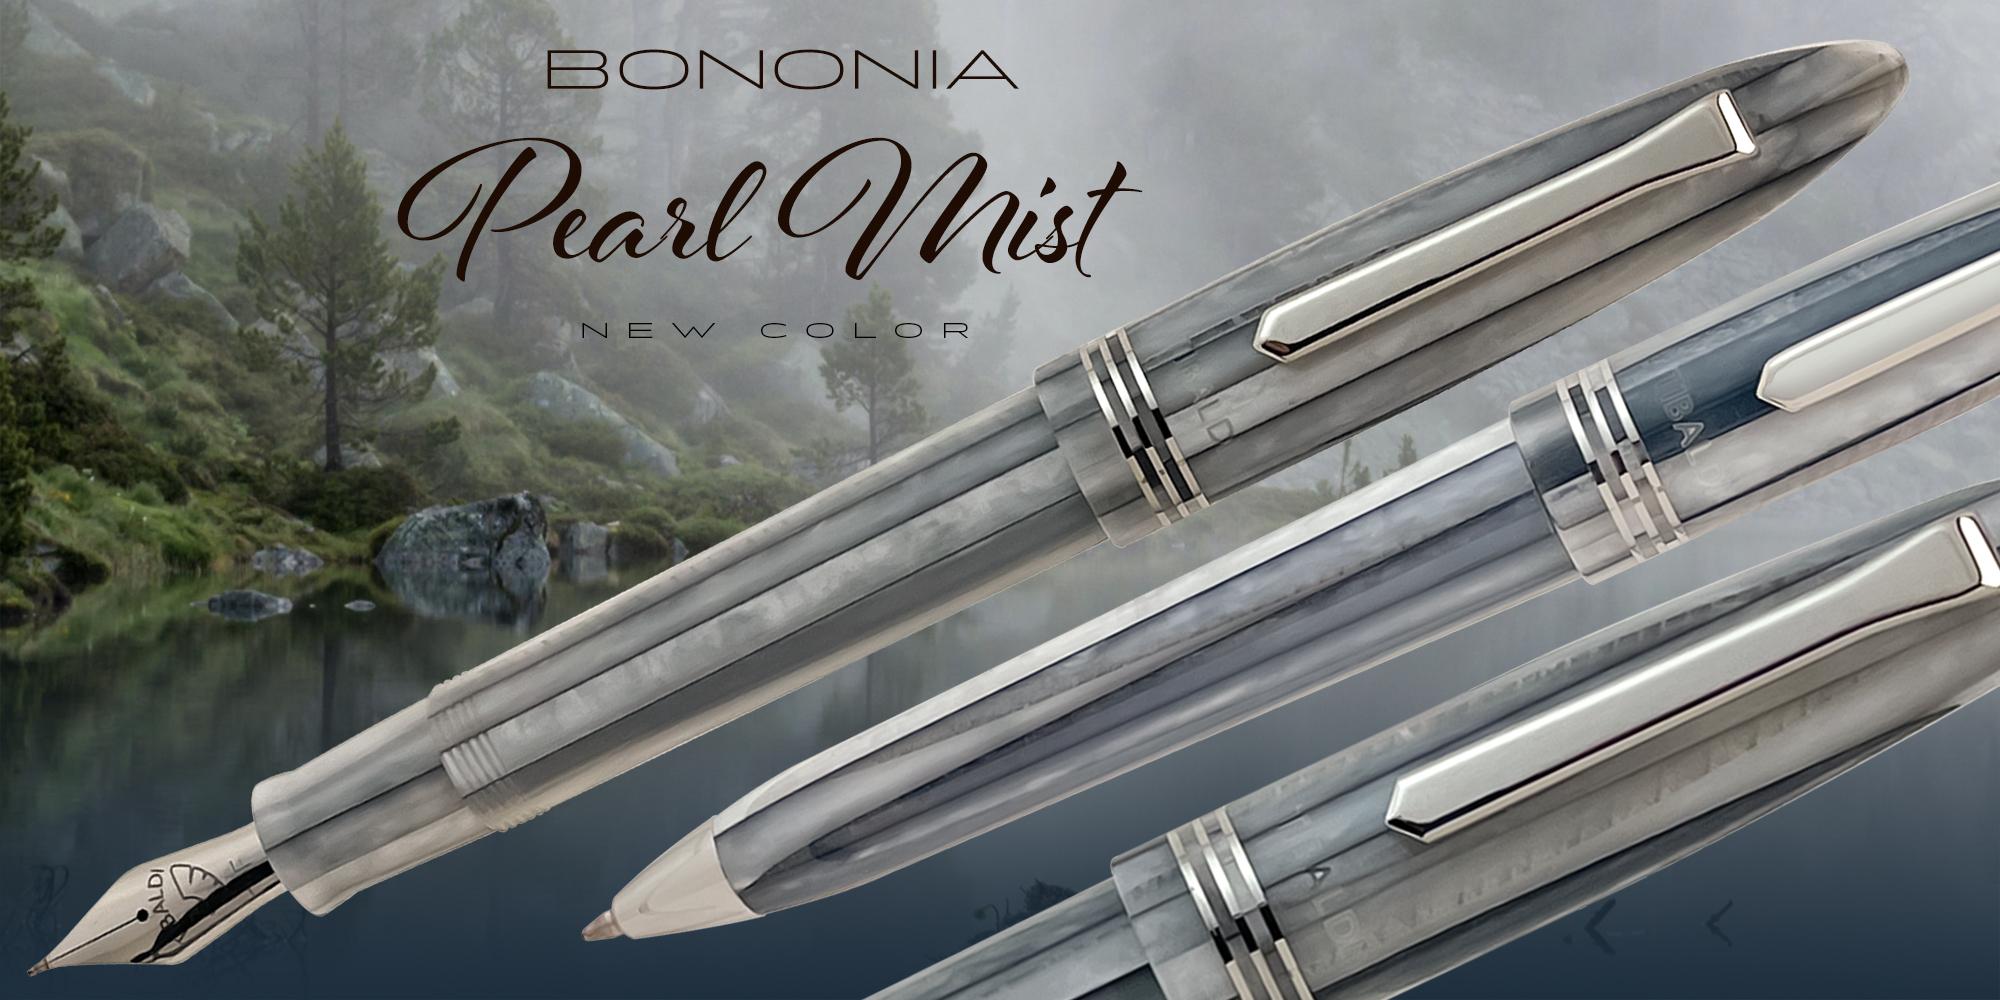 bononia-pearlmist-banner-new.jpg